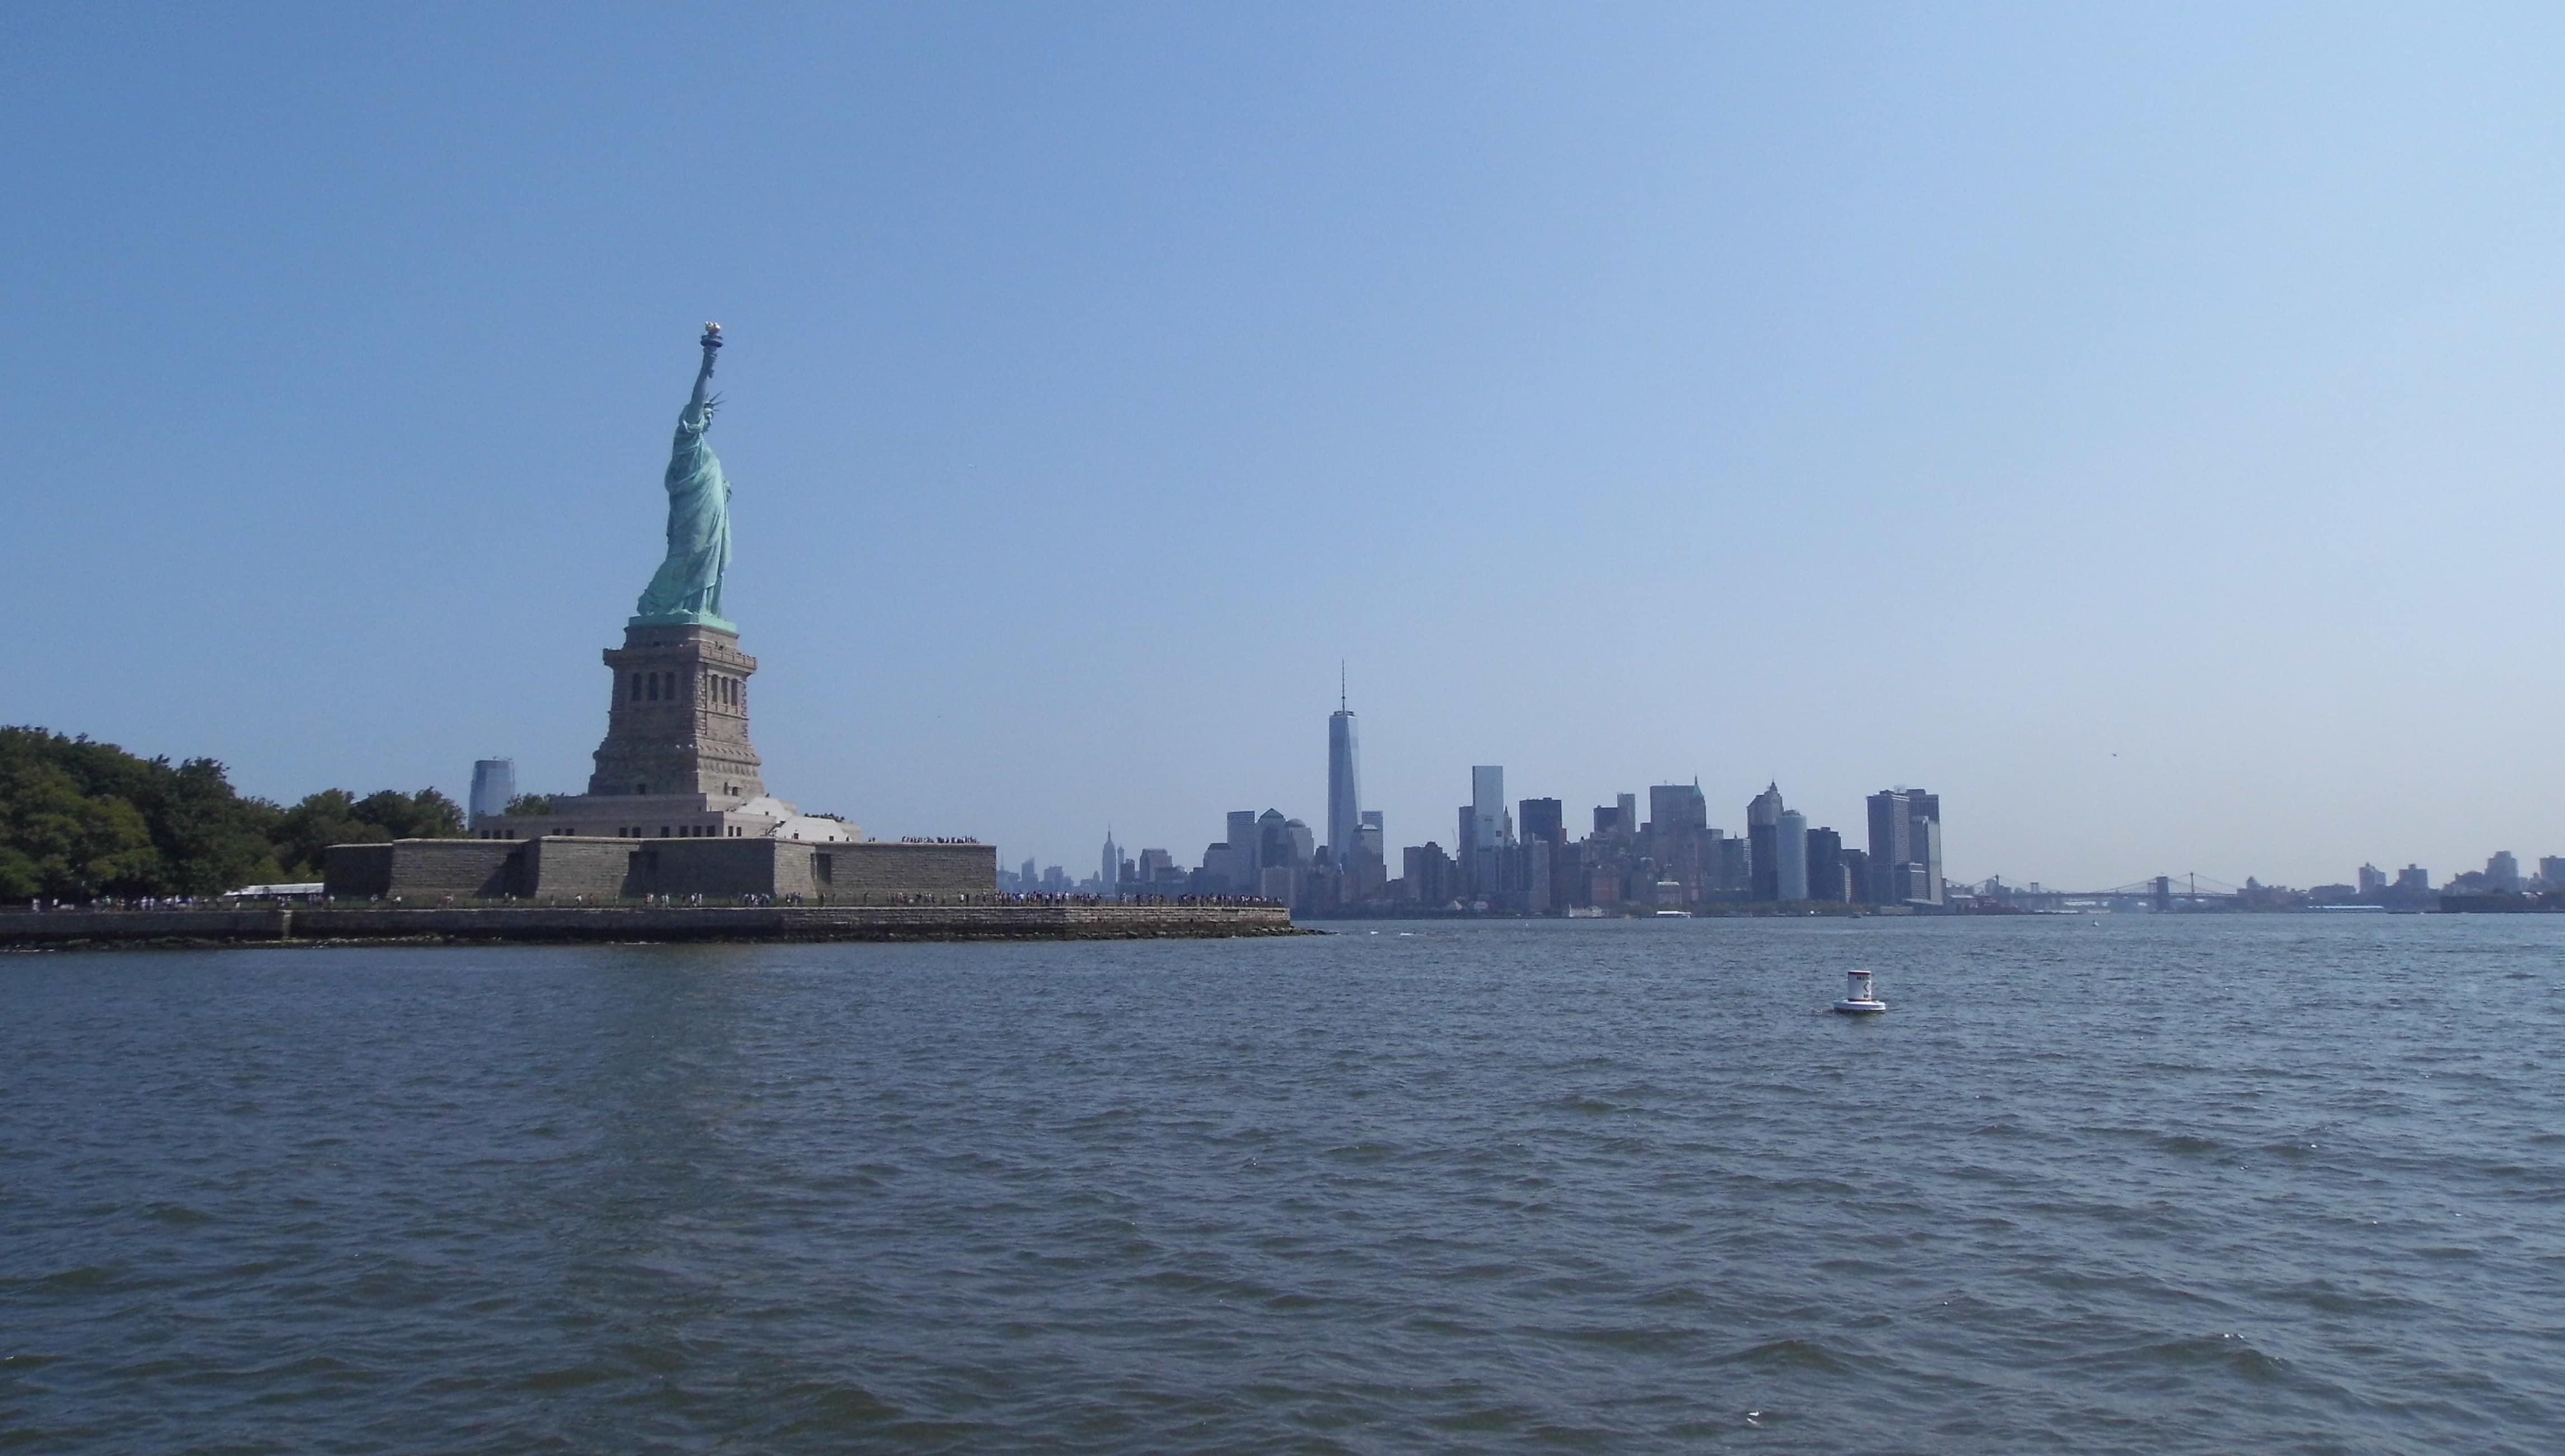 transatlantic cruise new york statue of liberty skyline